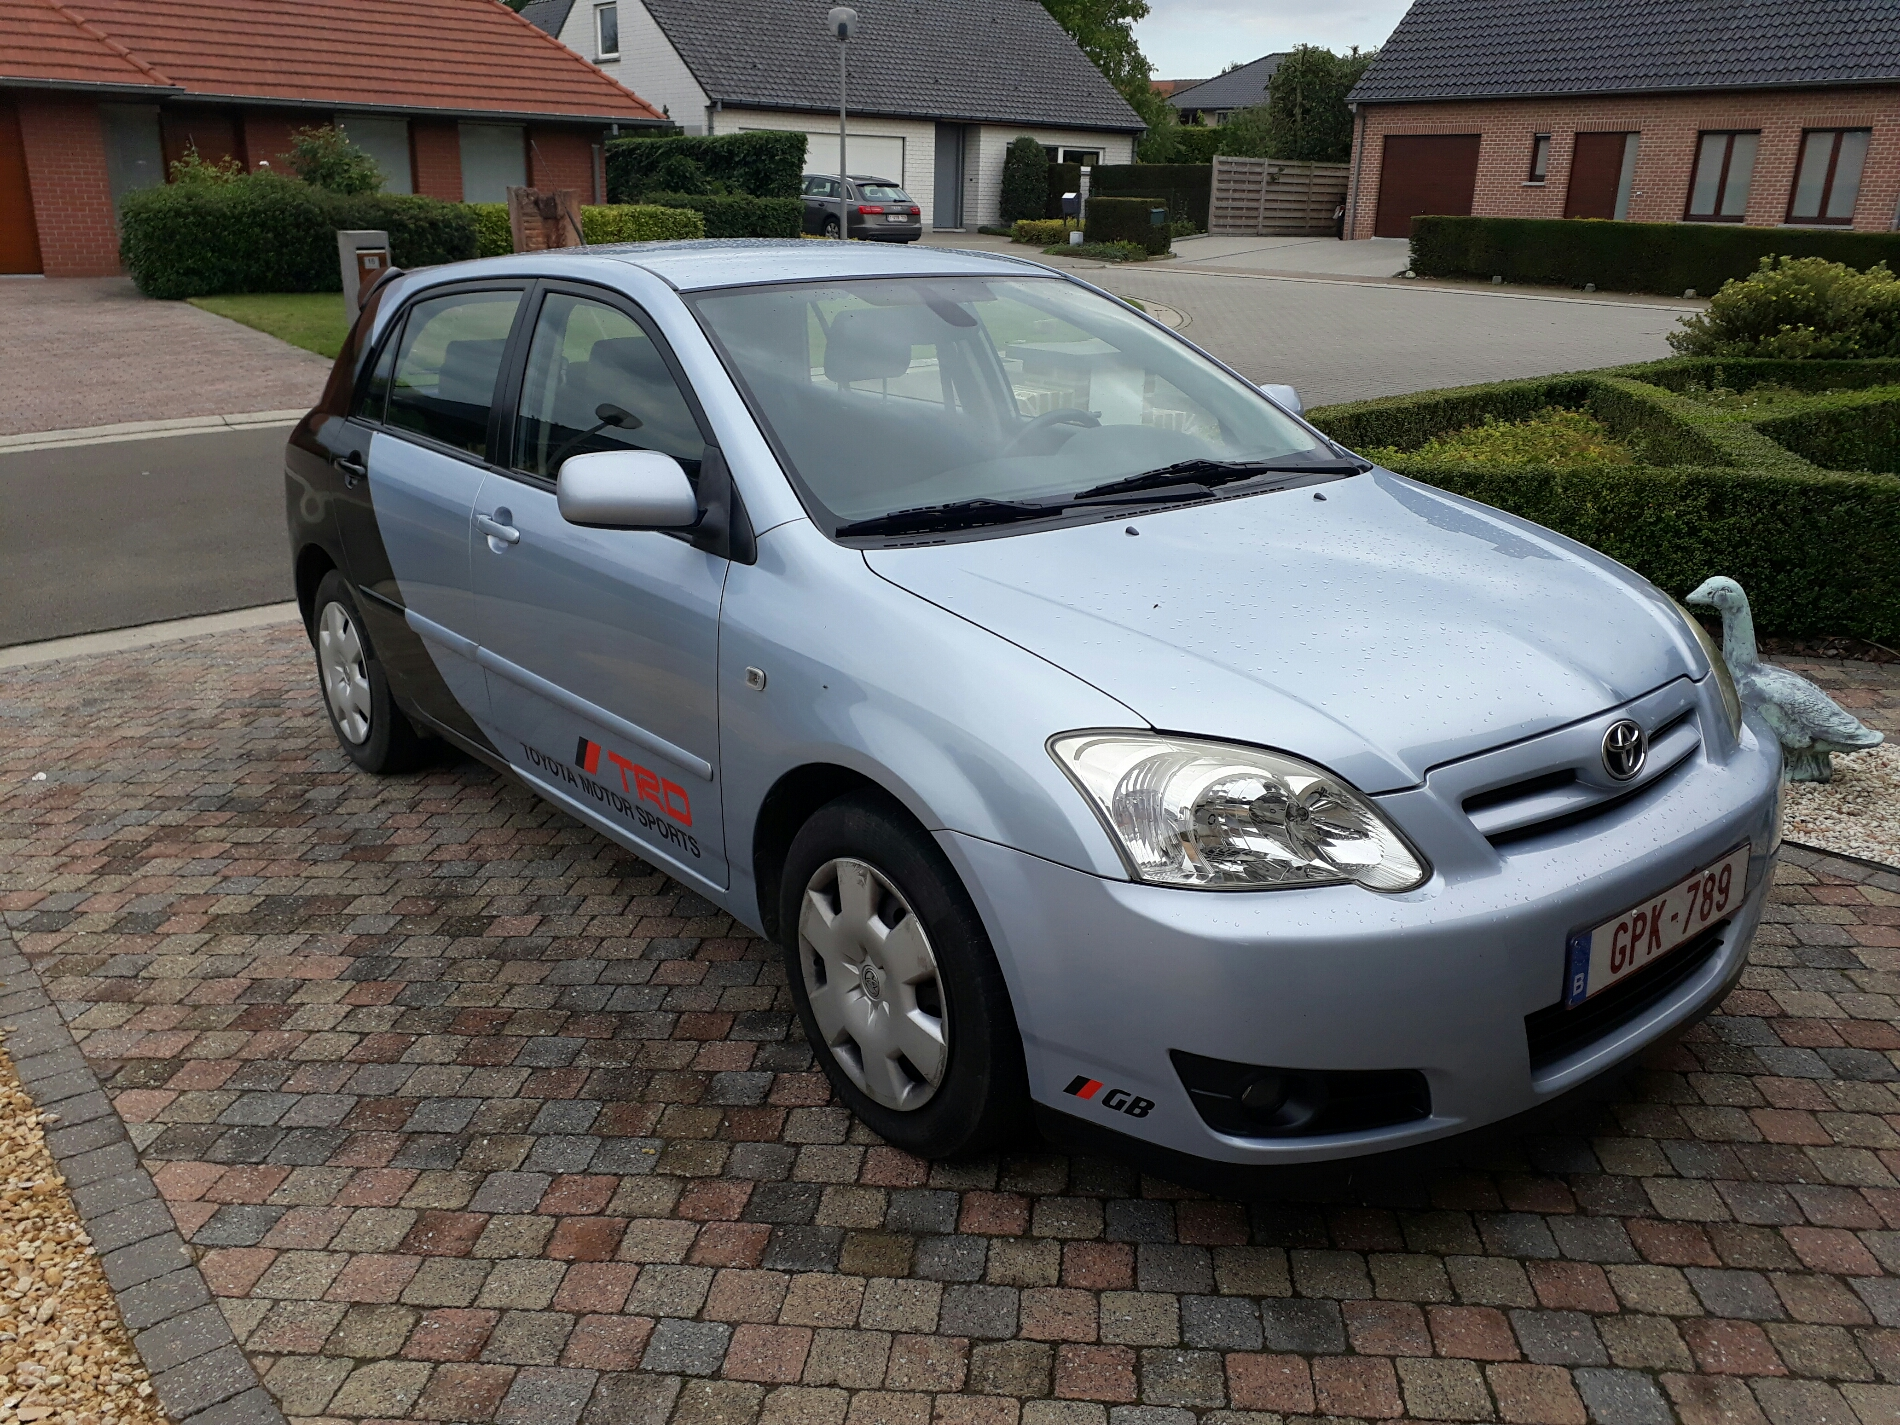 1005 - Toyota -Corolla - 2004